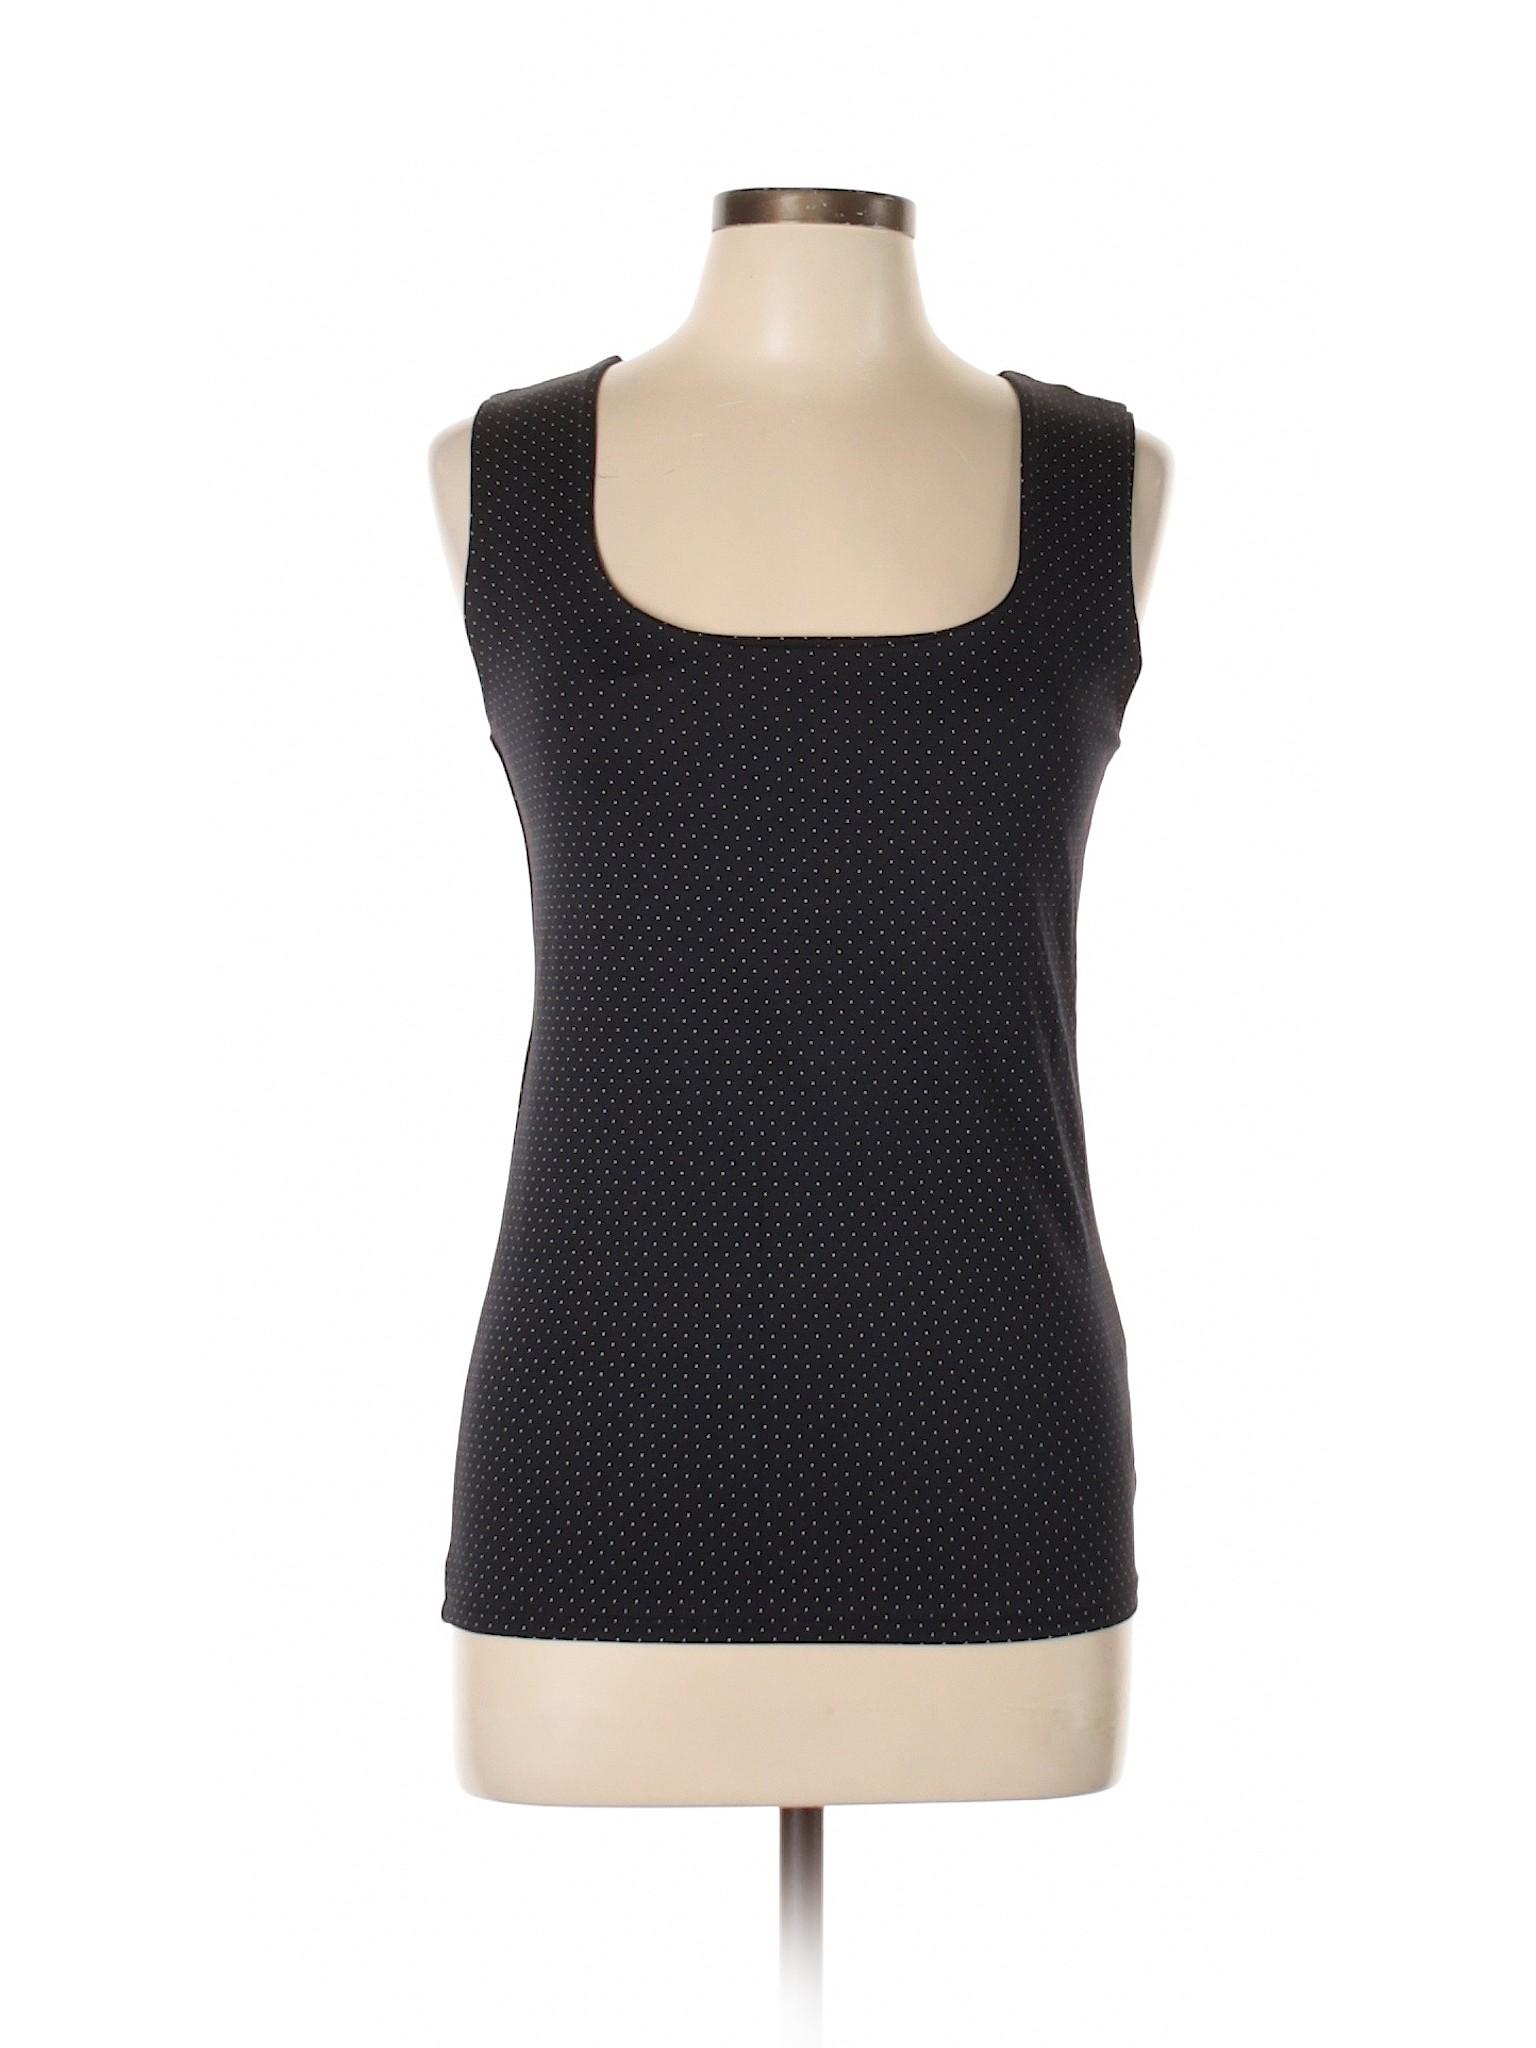 ec5ce278 Details about Zara W&B Collection Women Black Sleeveless Top Lg